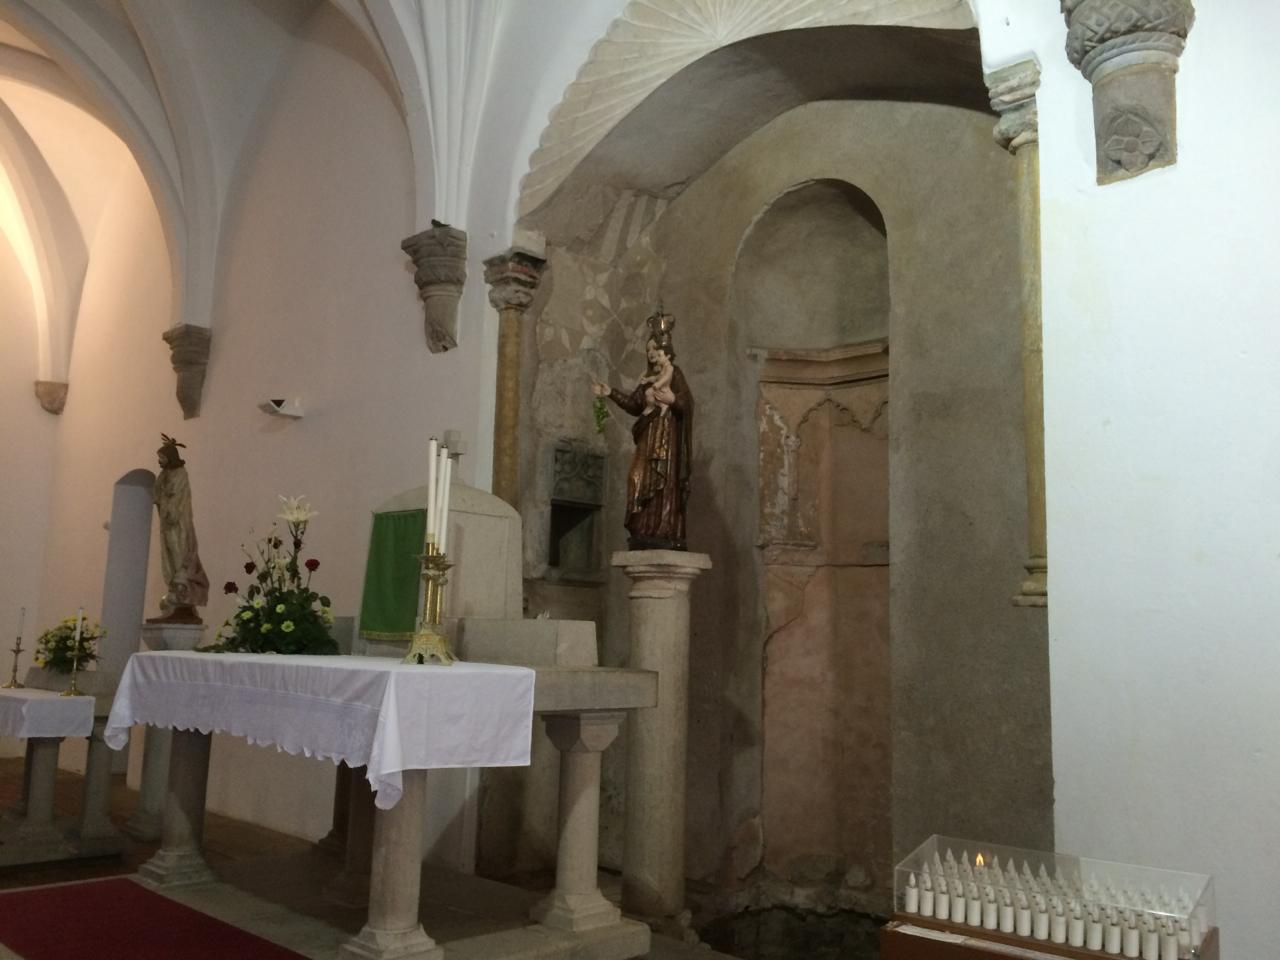 Inside the Catholic church in Mértola ...do you see the bird?